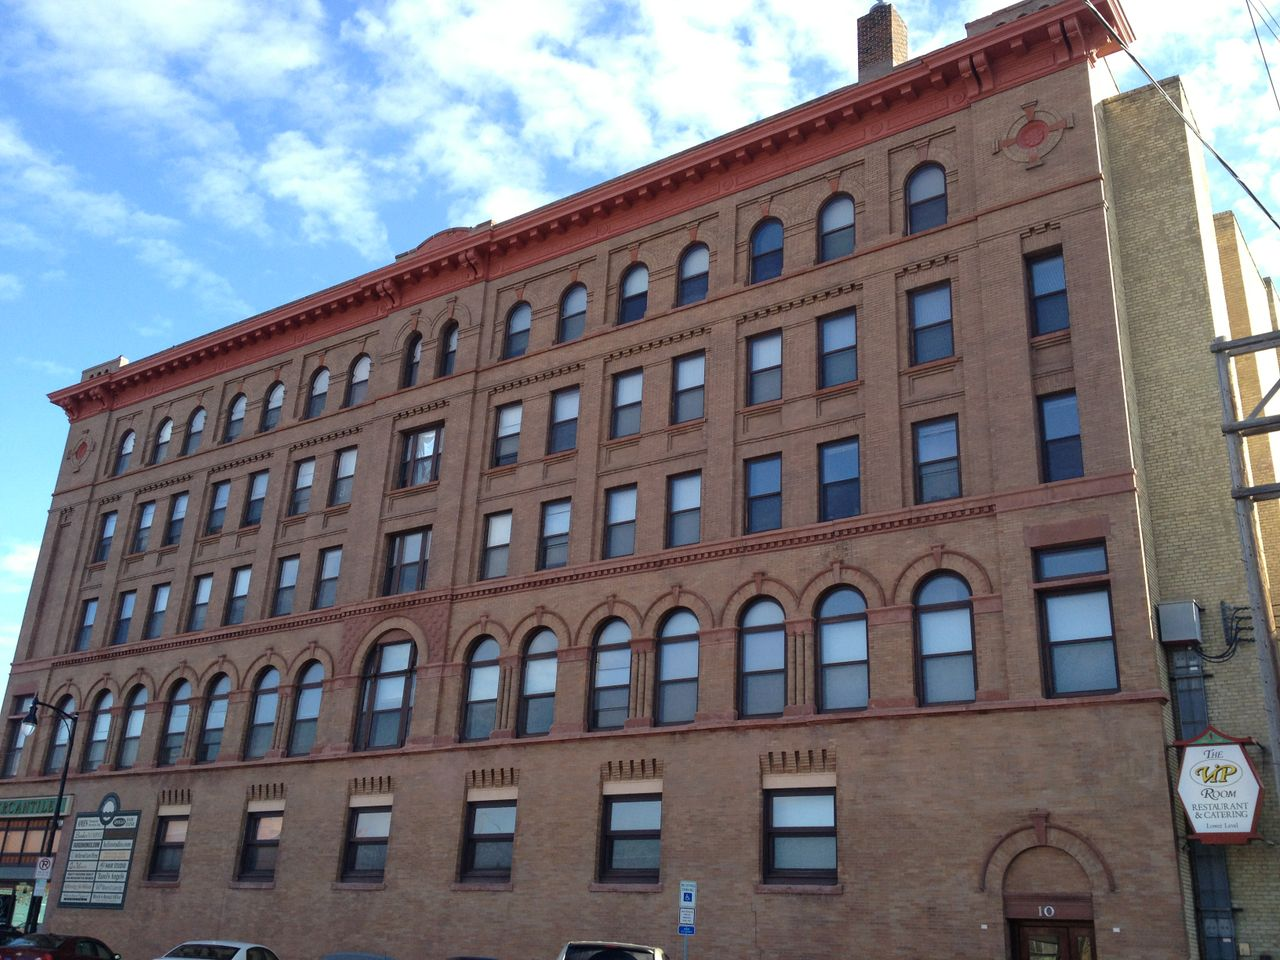 Block 6 Building Reportedly Haunted